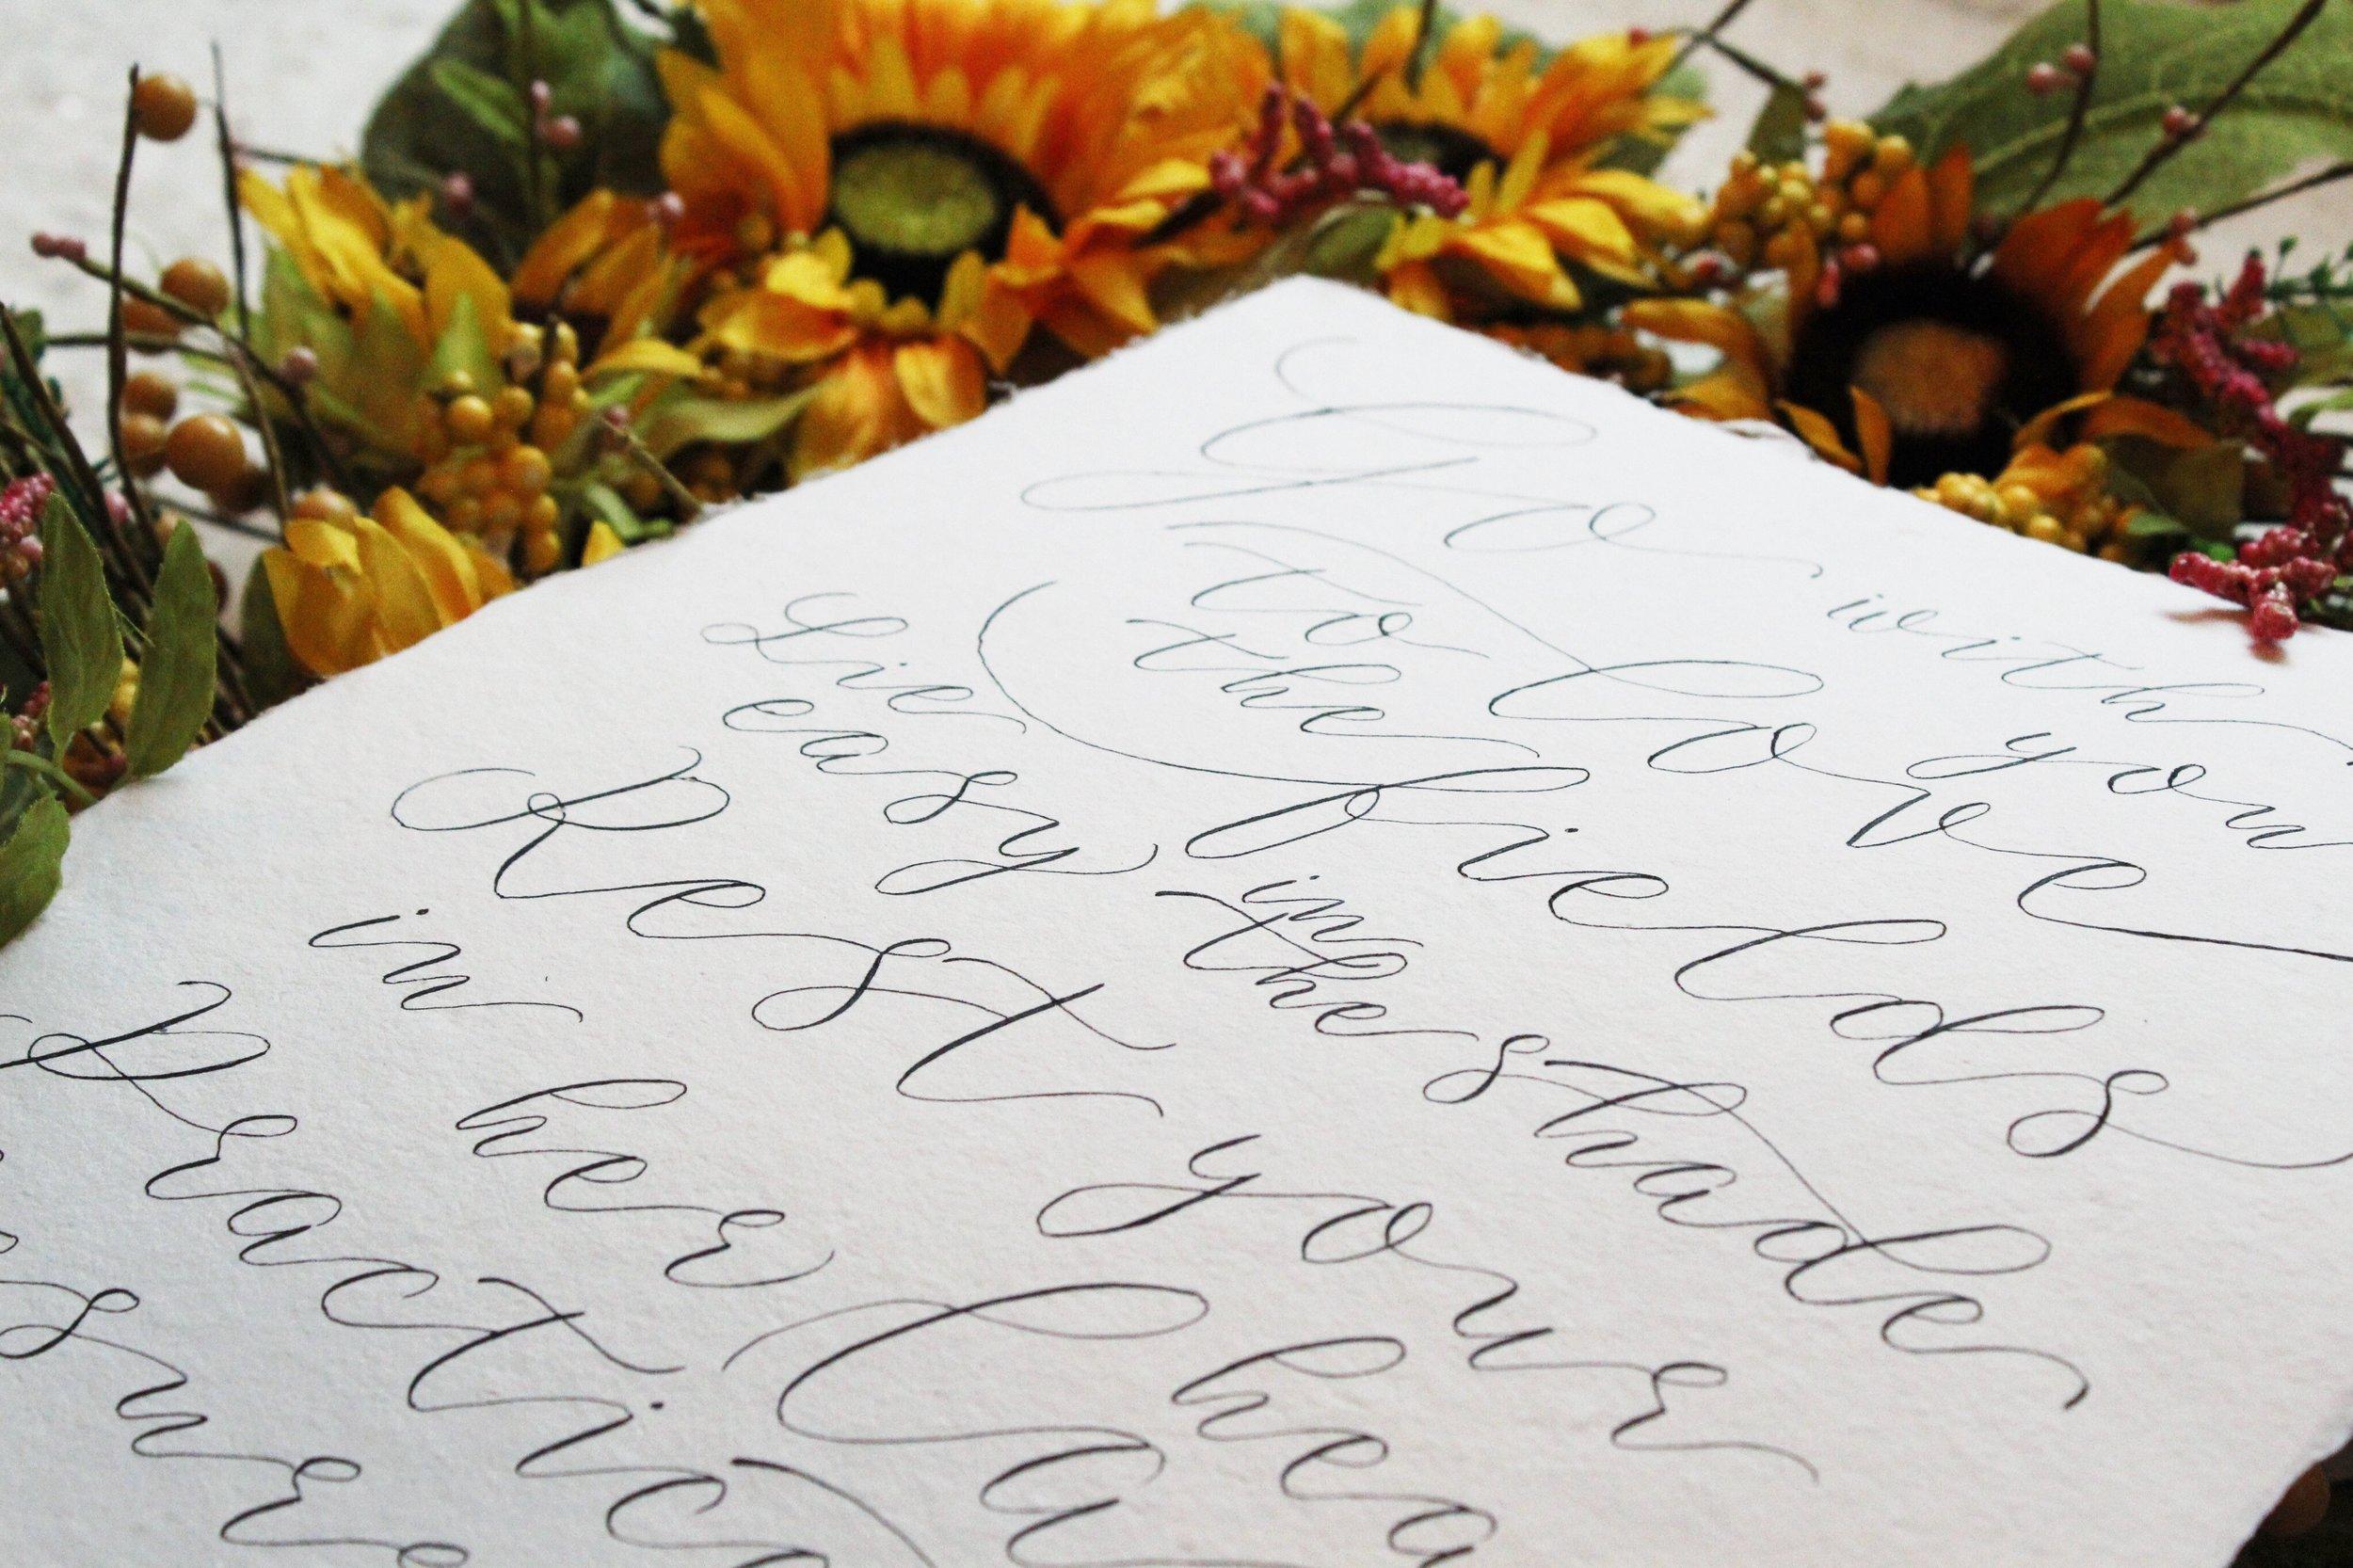 Central PA, York PA, JesSmith Designs, custom, wedding, invitations, bridal, announcements, save the date, baby, hanover, calligraphy, baltimore, wedding invitations, lancaster, gettysburg-05-10 05.11.30.jpg